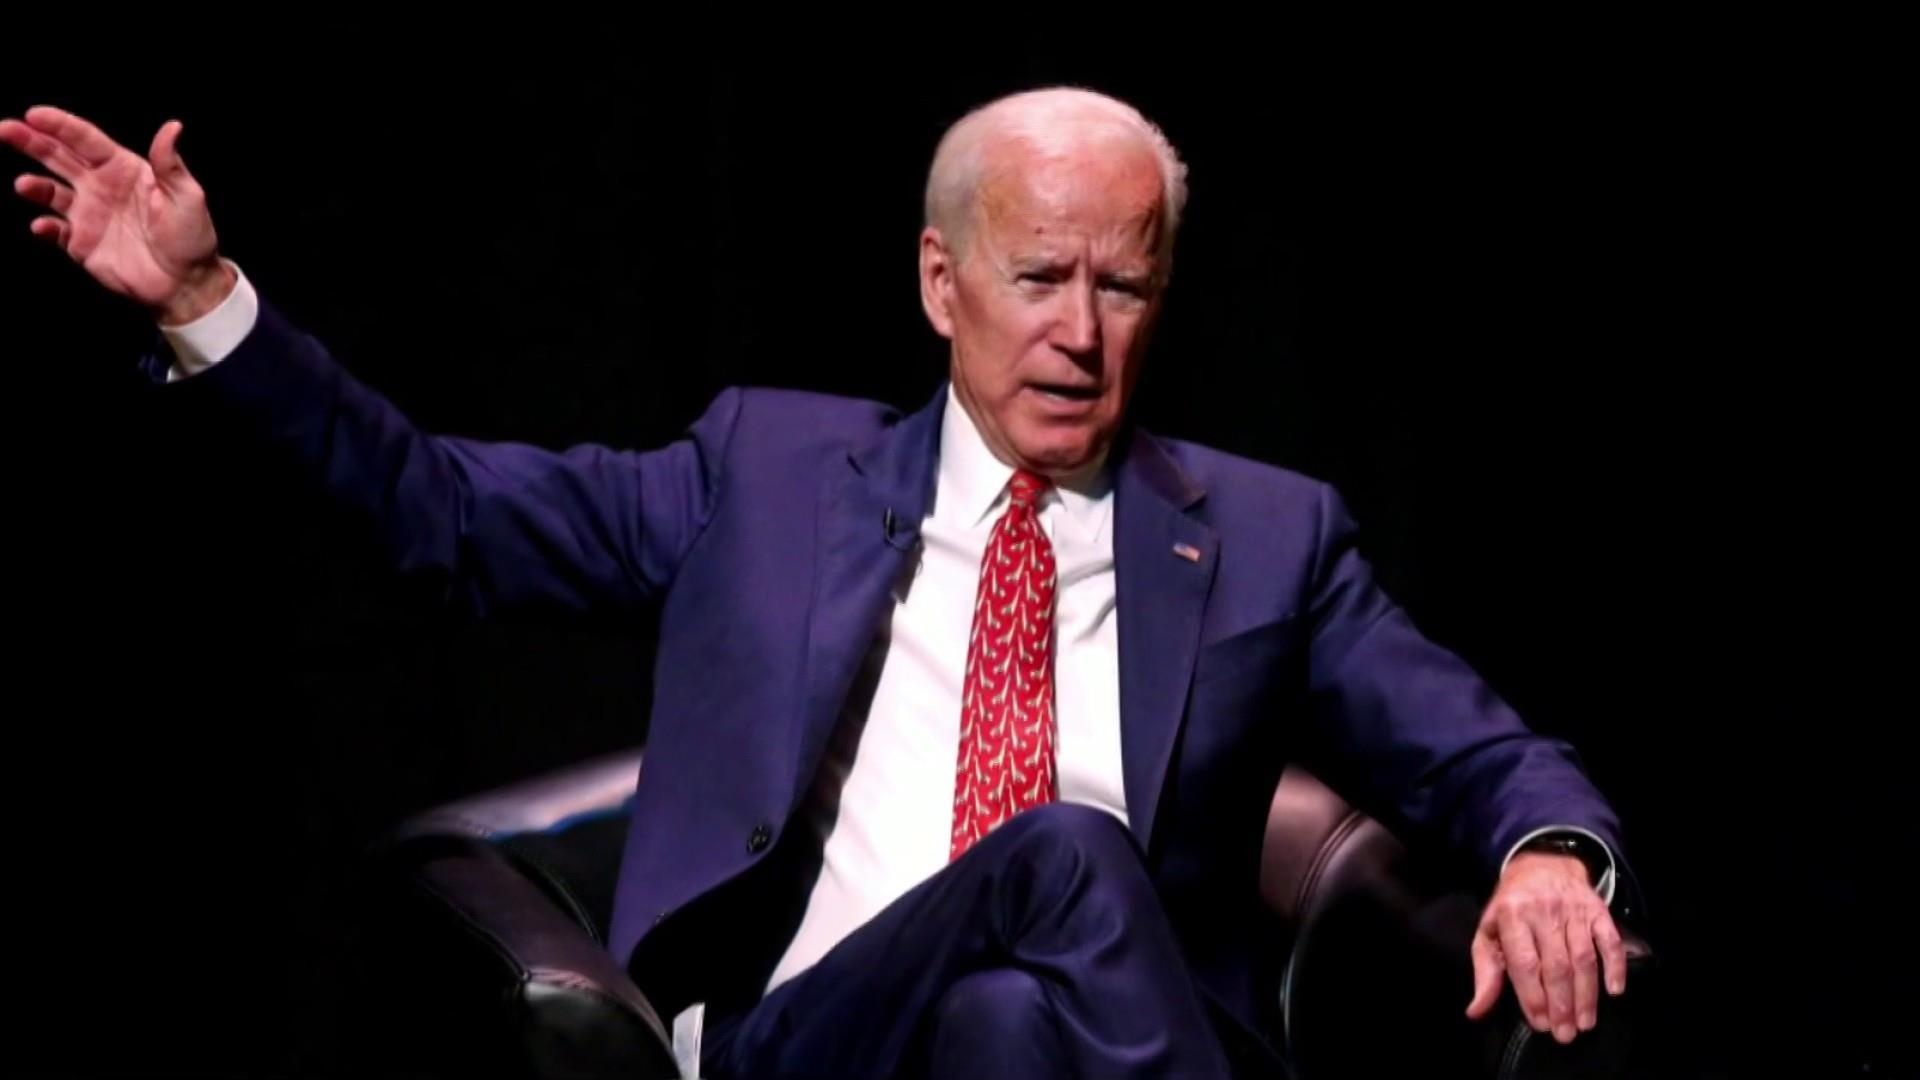 Advice to Biden: Don't start out on apology tour, says strategist